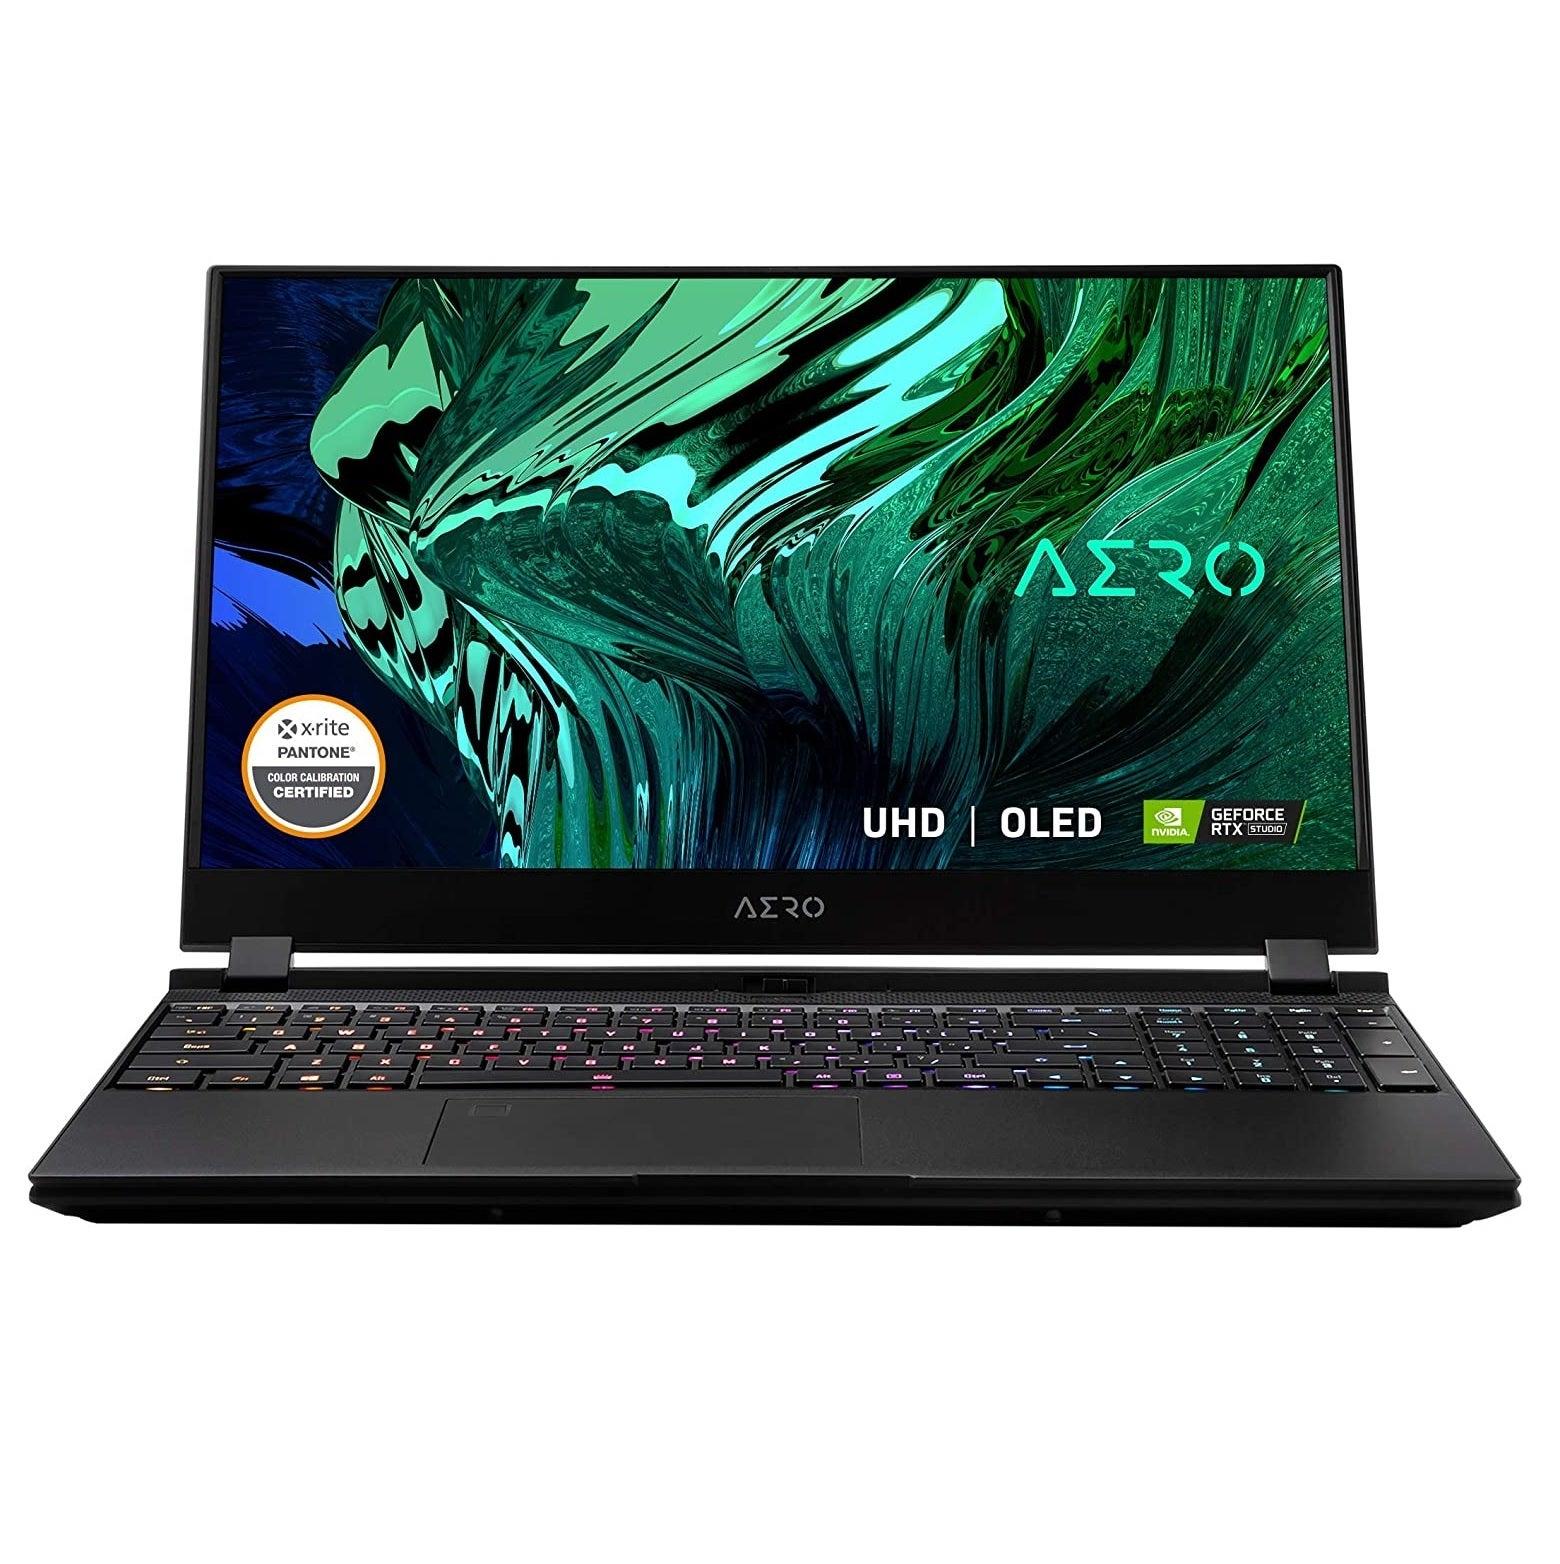 Gigabyte Aero 15 OLED KD 15 inch Gaming Laptop